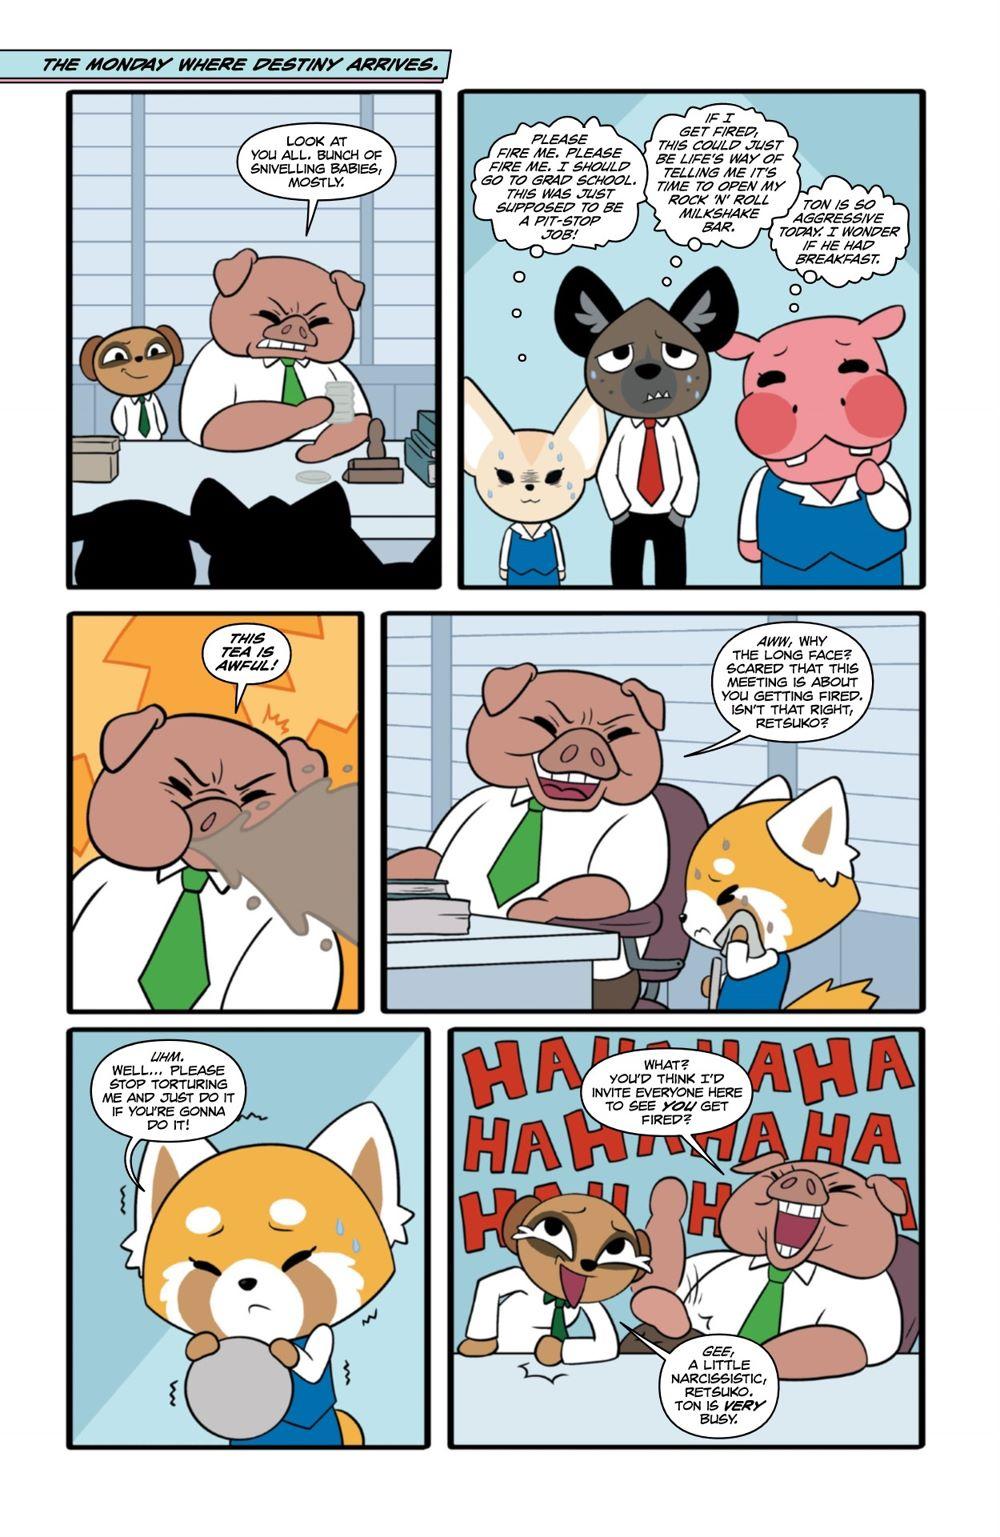 AGGRETSUKO-MHW-2-MARKETING-05-1 ComicList Previews: AGGRETSUKO MEET HER WORLD #2